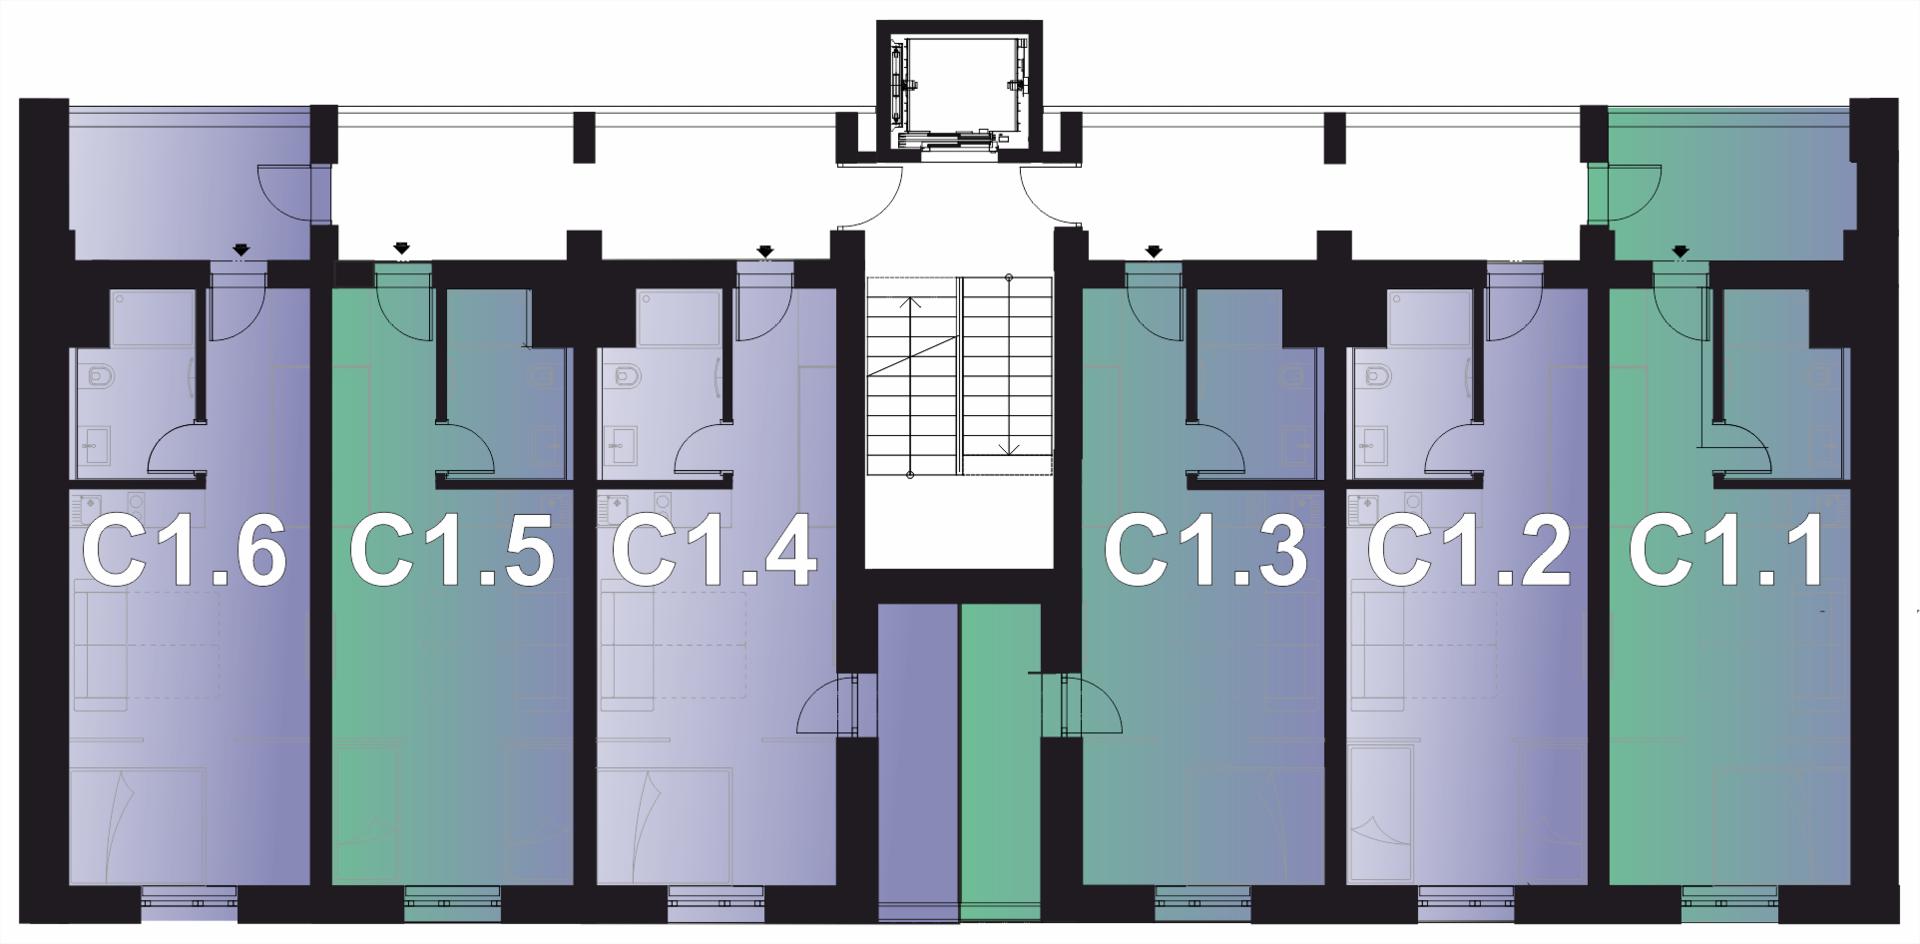 Klinovec-APTC-ALL-v4.1-1NP.png